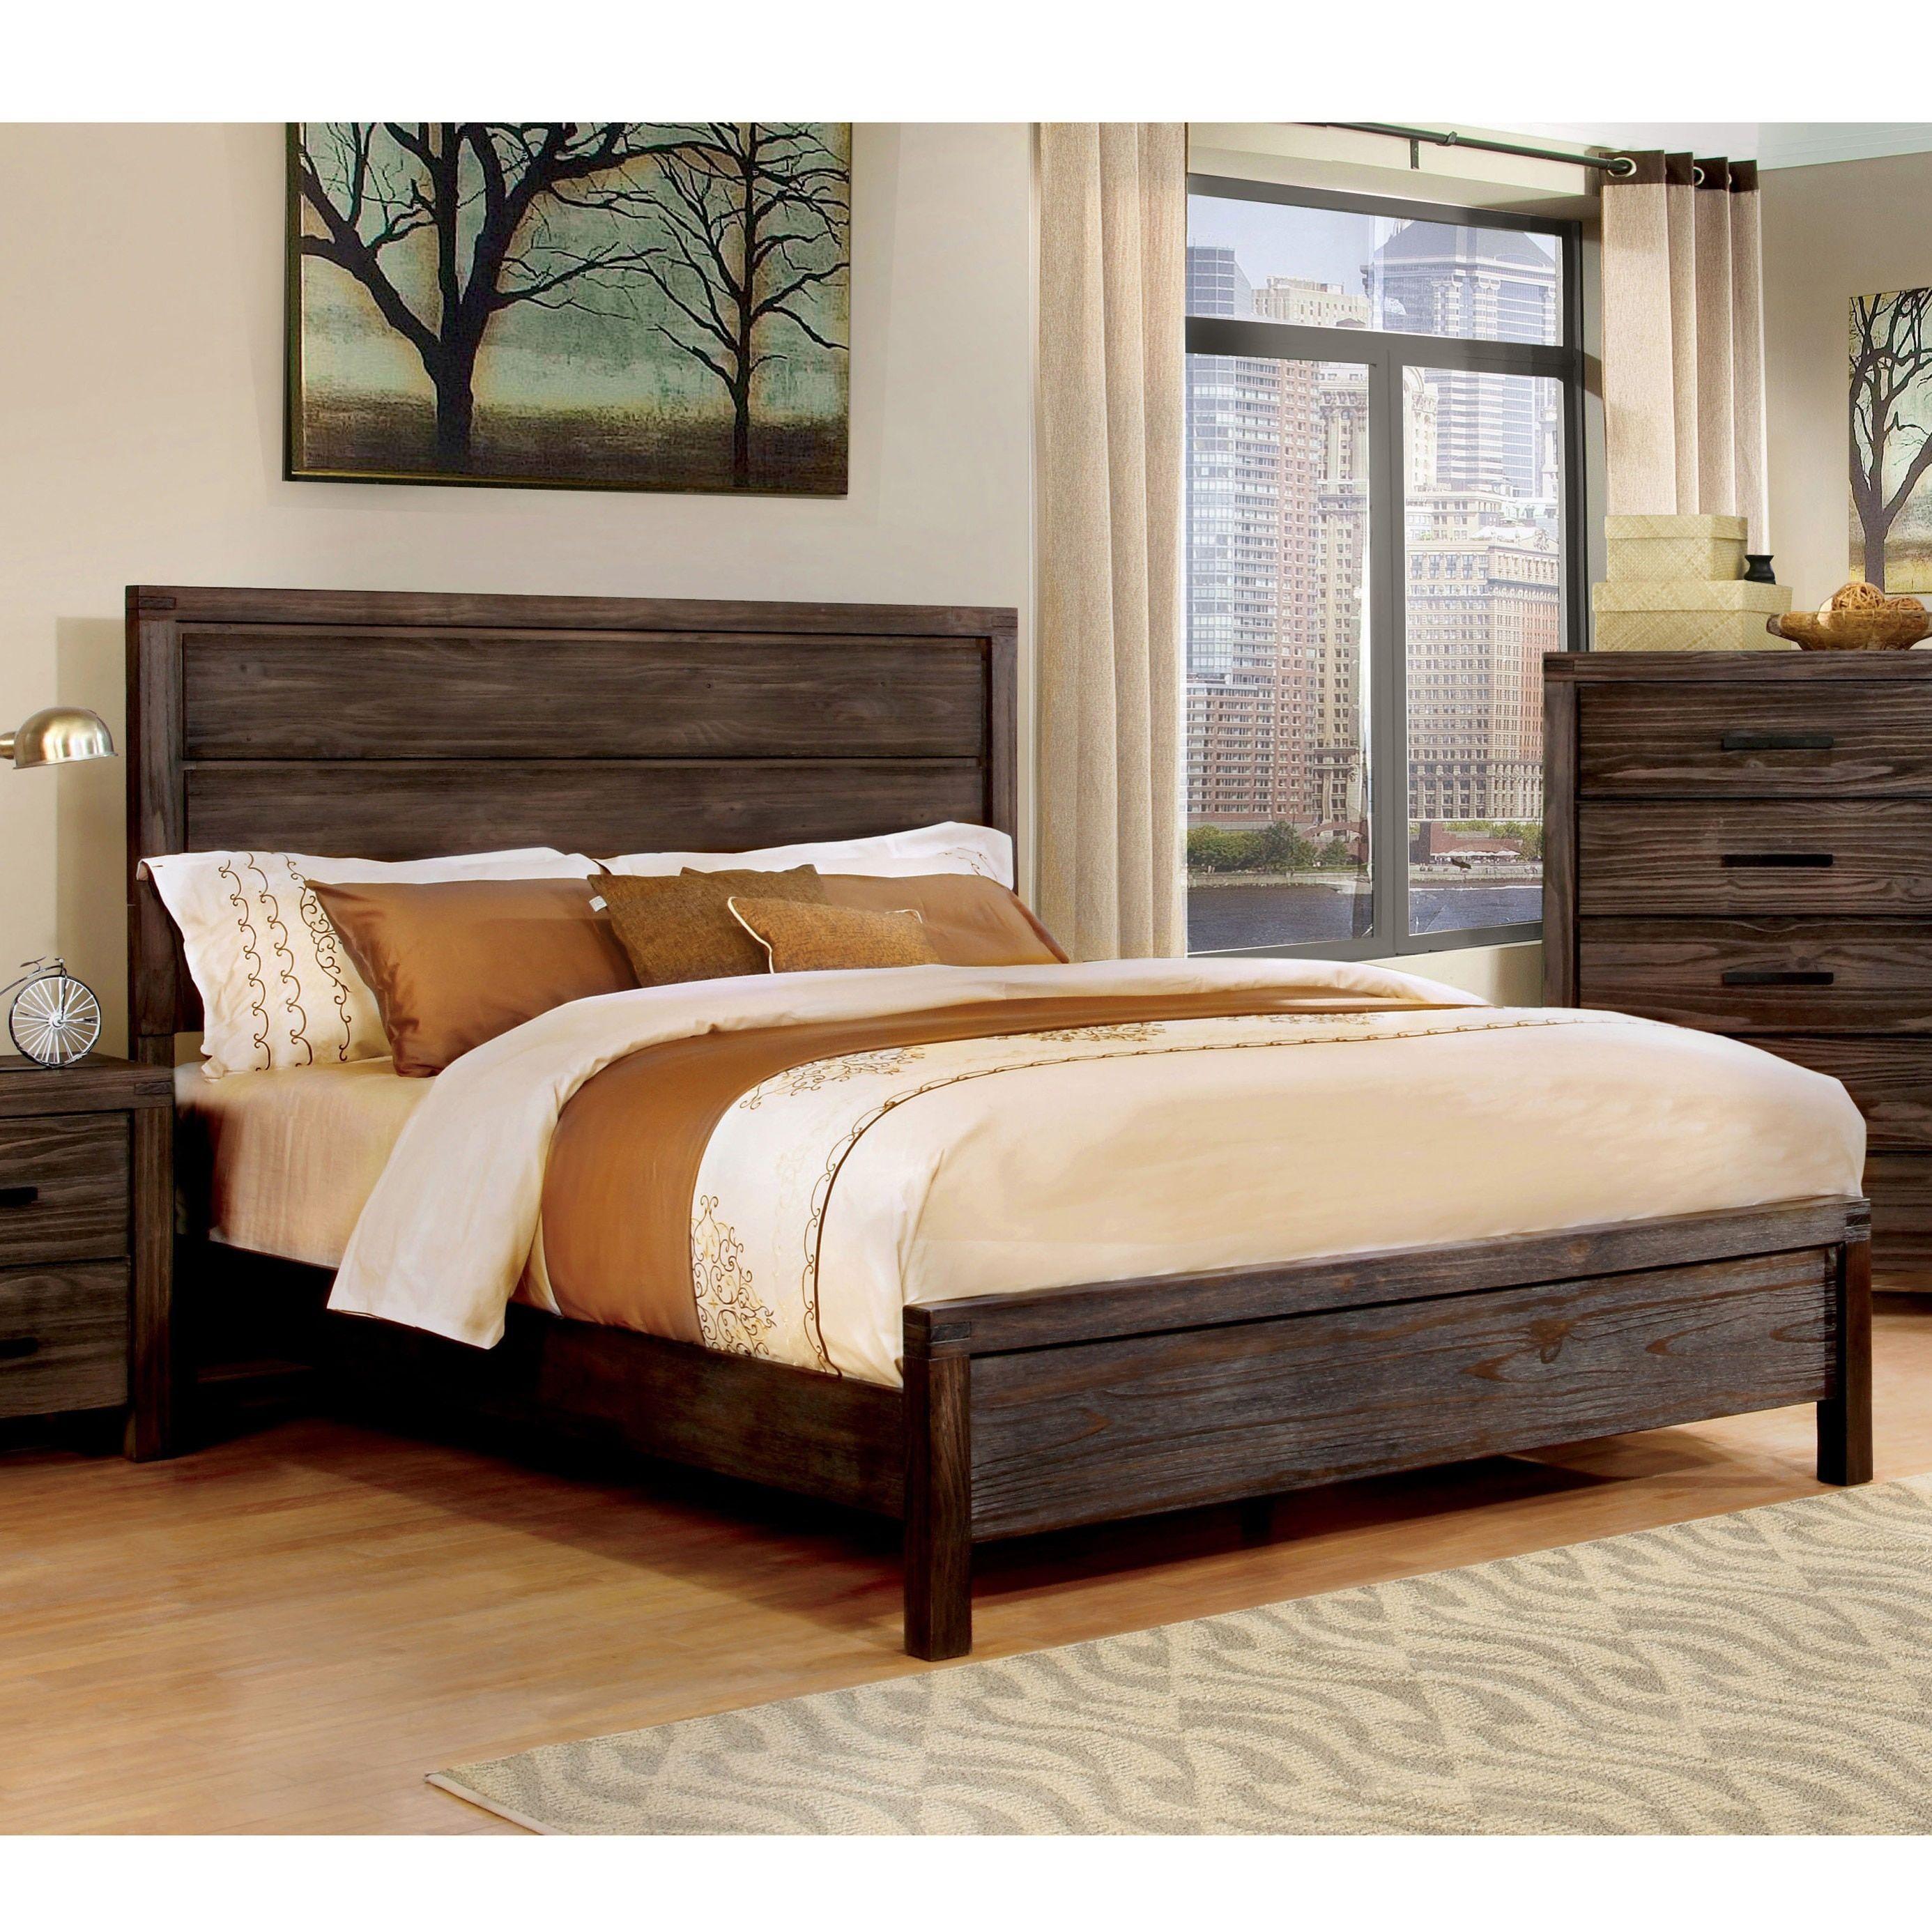 Furniture Of America Nali Rustic Grey Solid Wood Panel Bed Furniture Panel Bed Bedroom Furniture